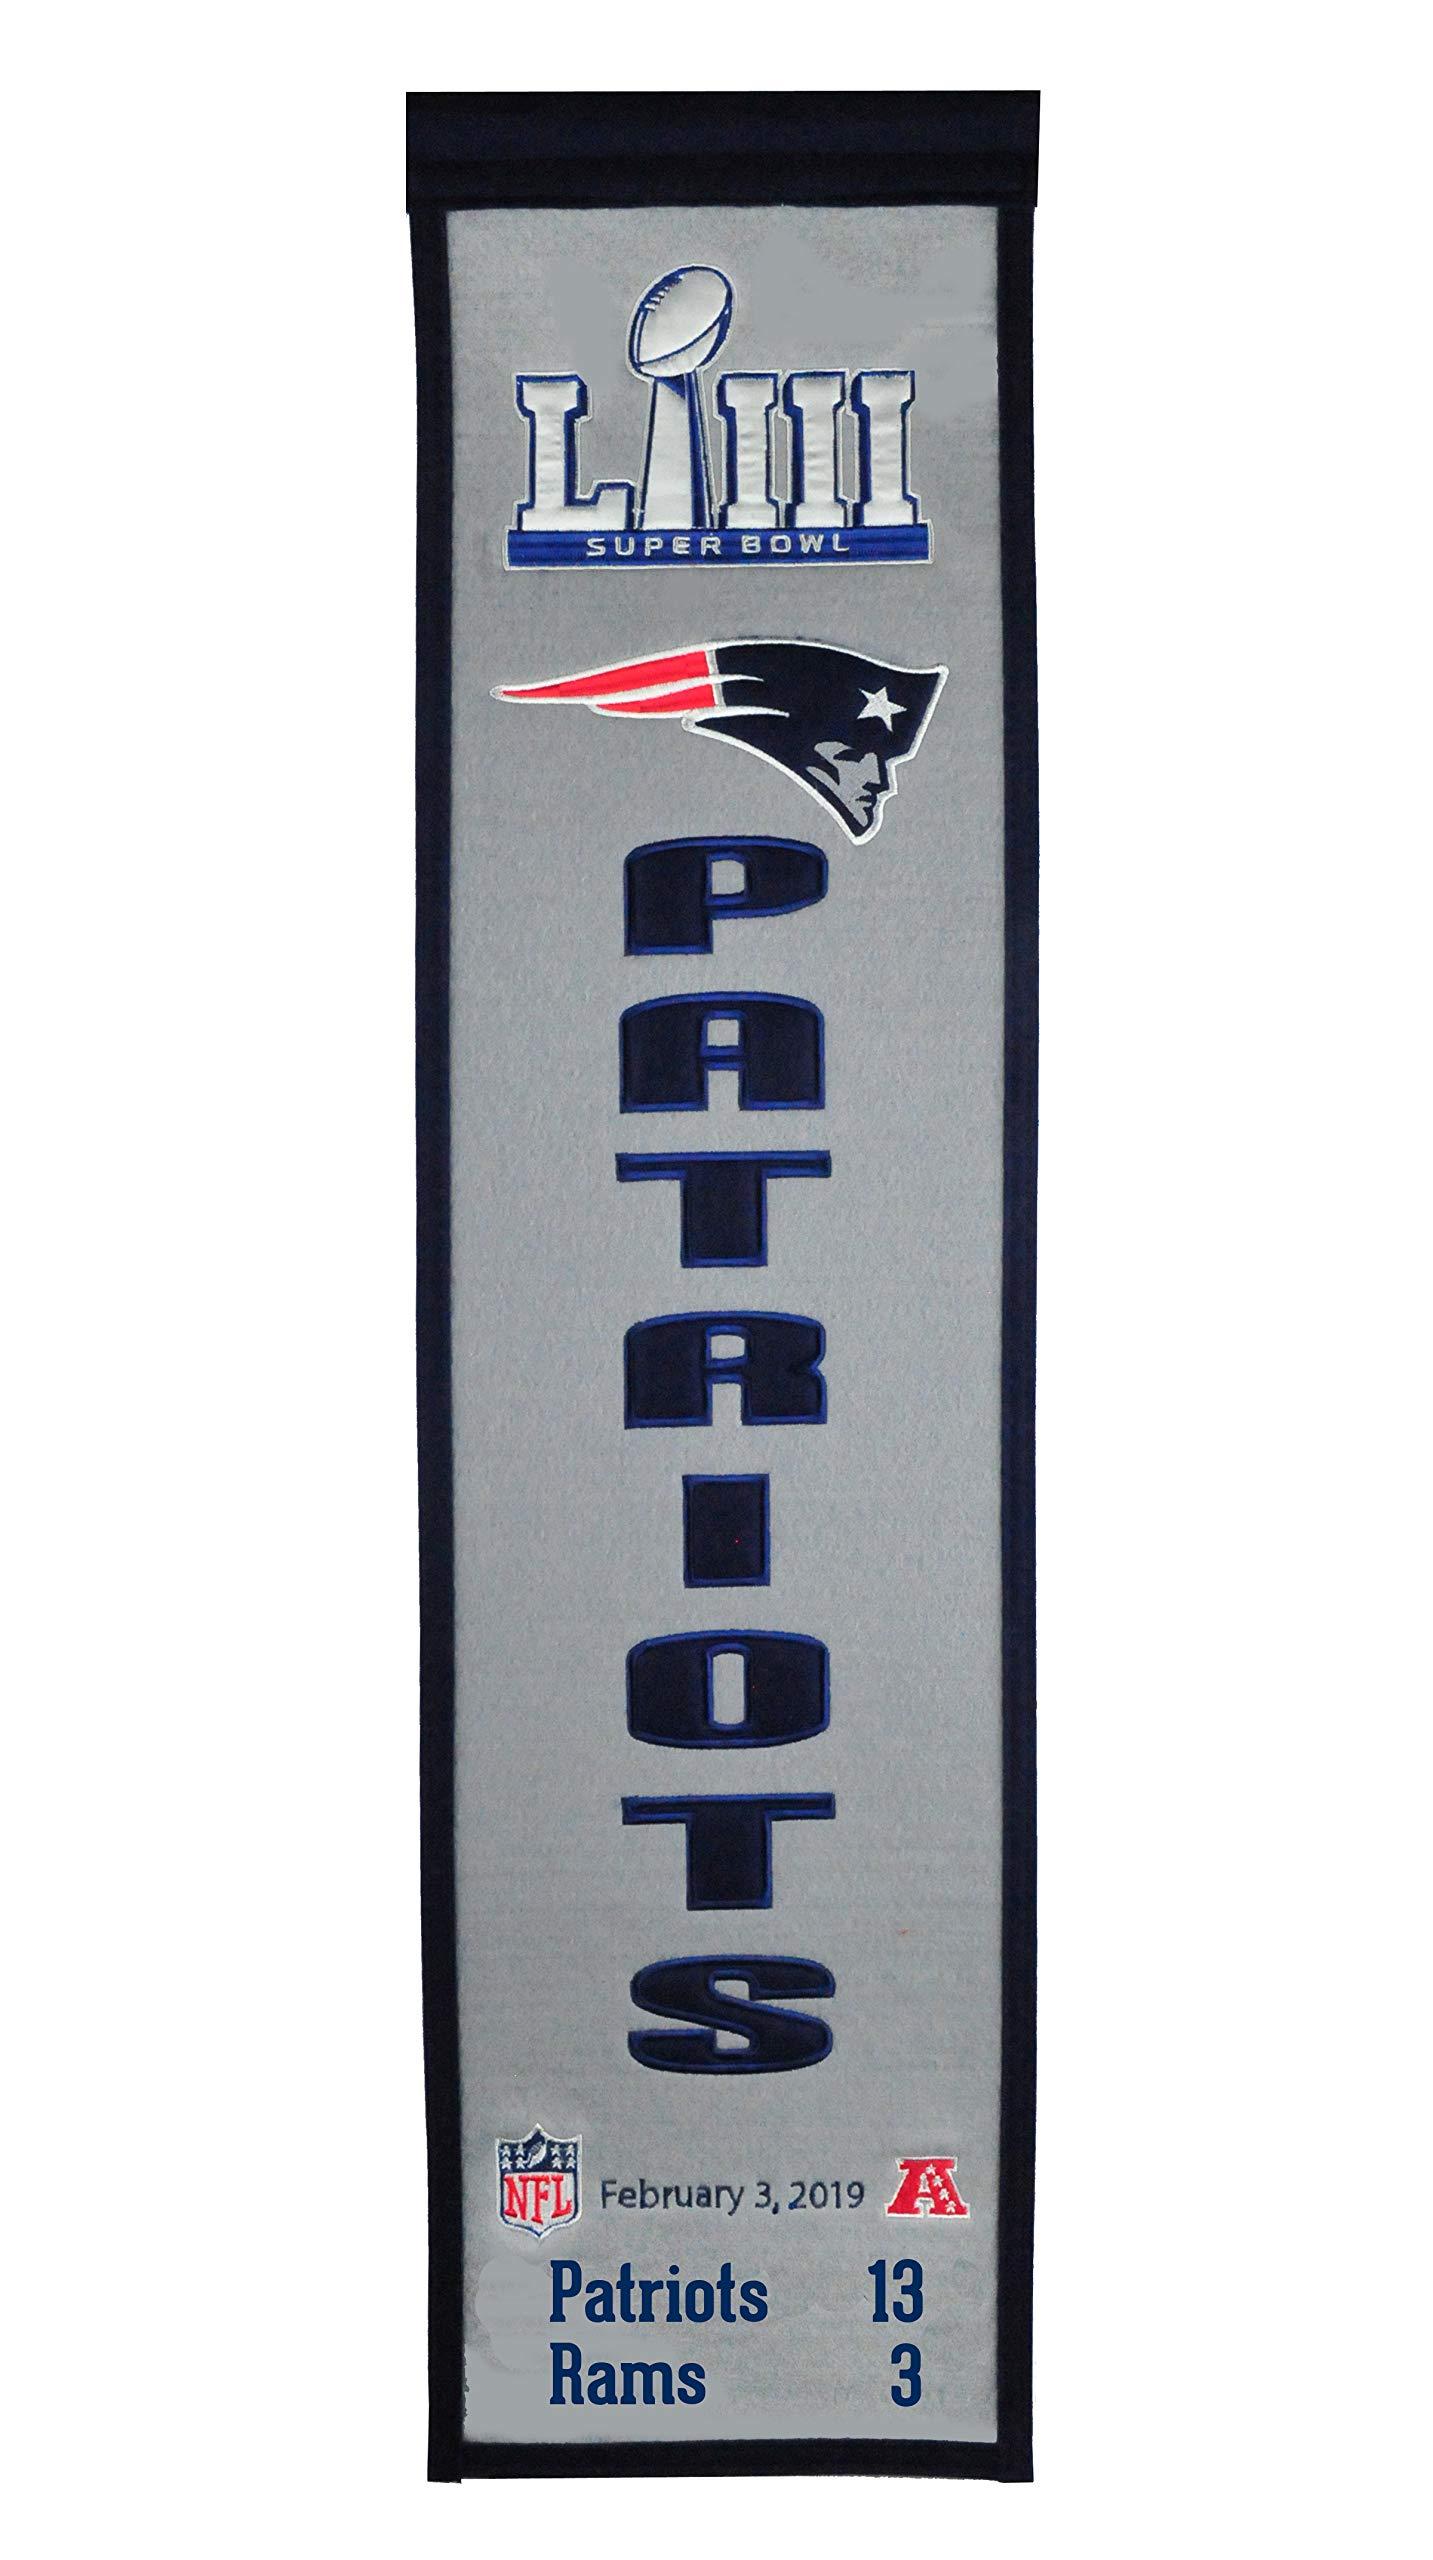 Winning Streak NFL New England Patriots Unisex Super Bowl 53 New England Patriots Heritage BannerSuper Bowl 53 New England Patriots Heritage Banner, Navy, Banner by Winning Streak